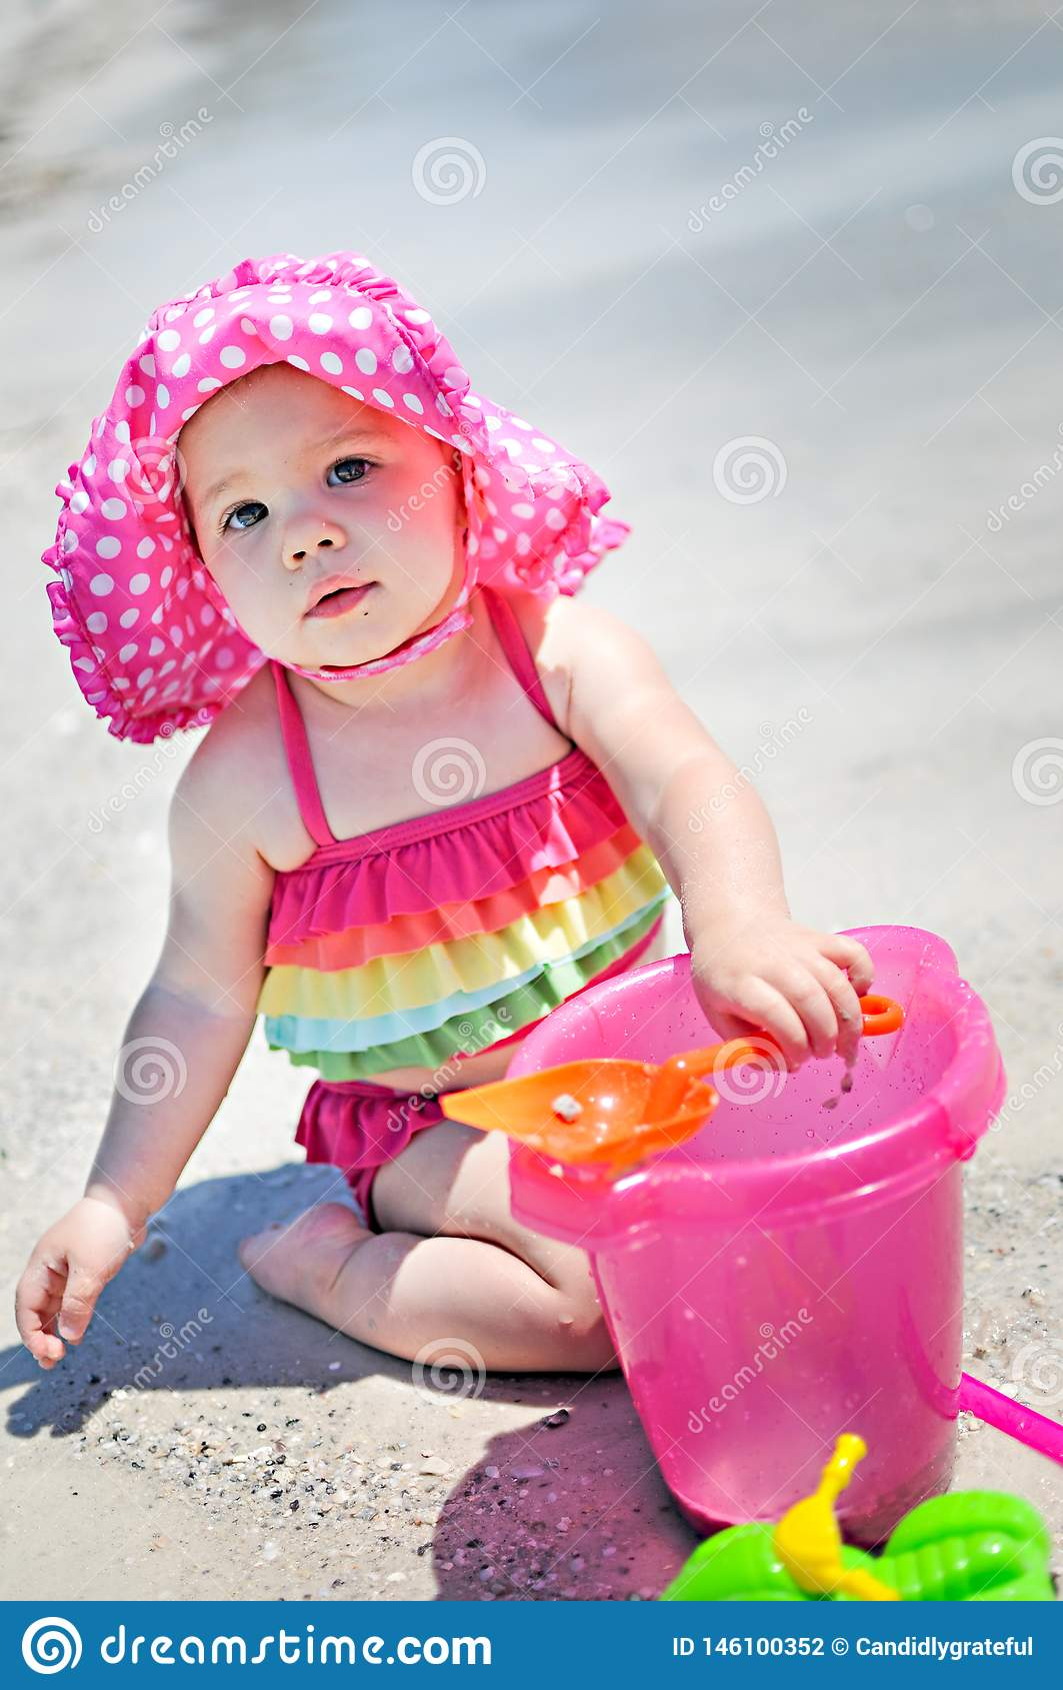 Ребенок со шляпой солнца на игре в песке на пляже